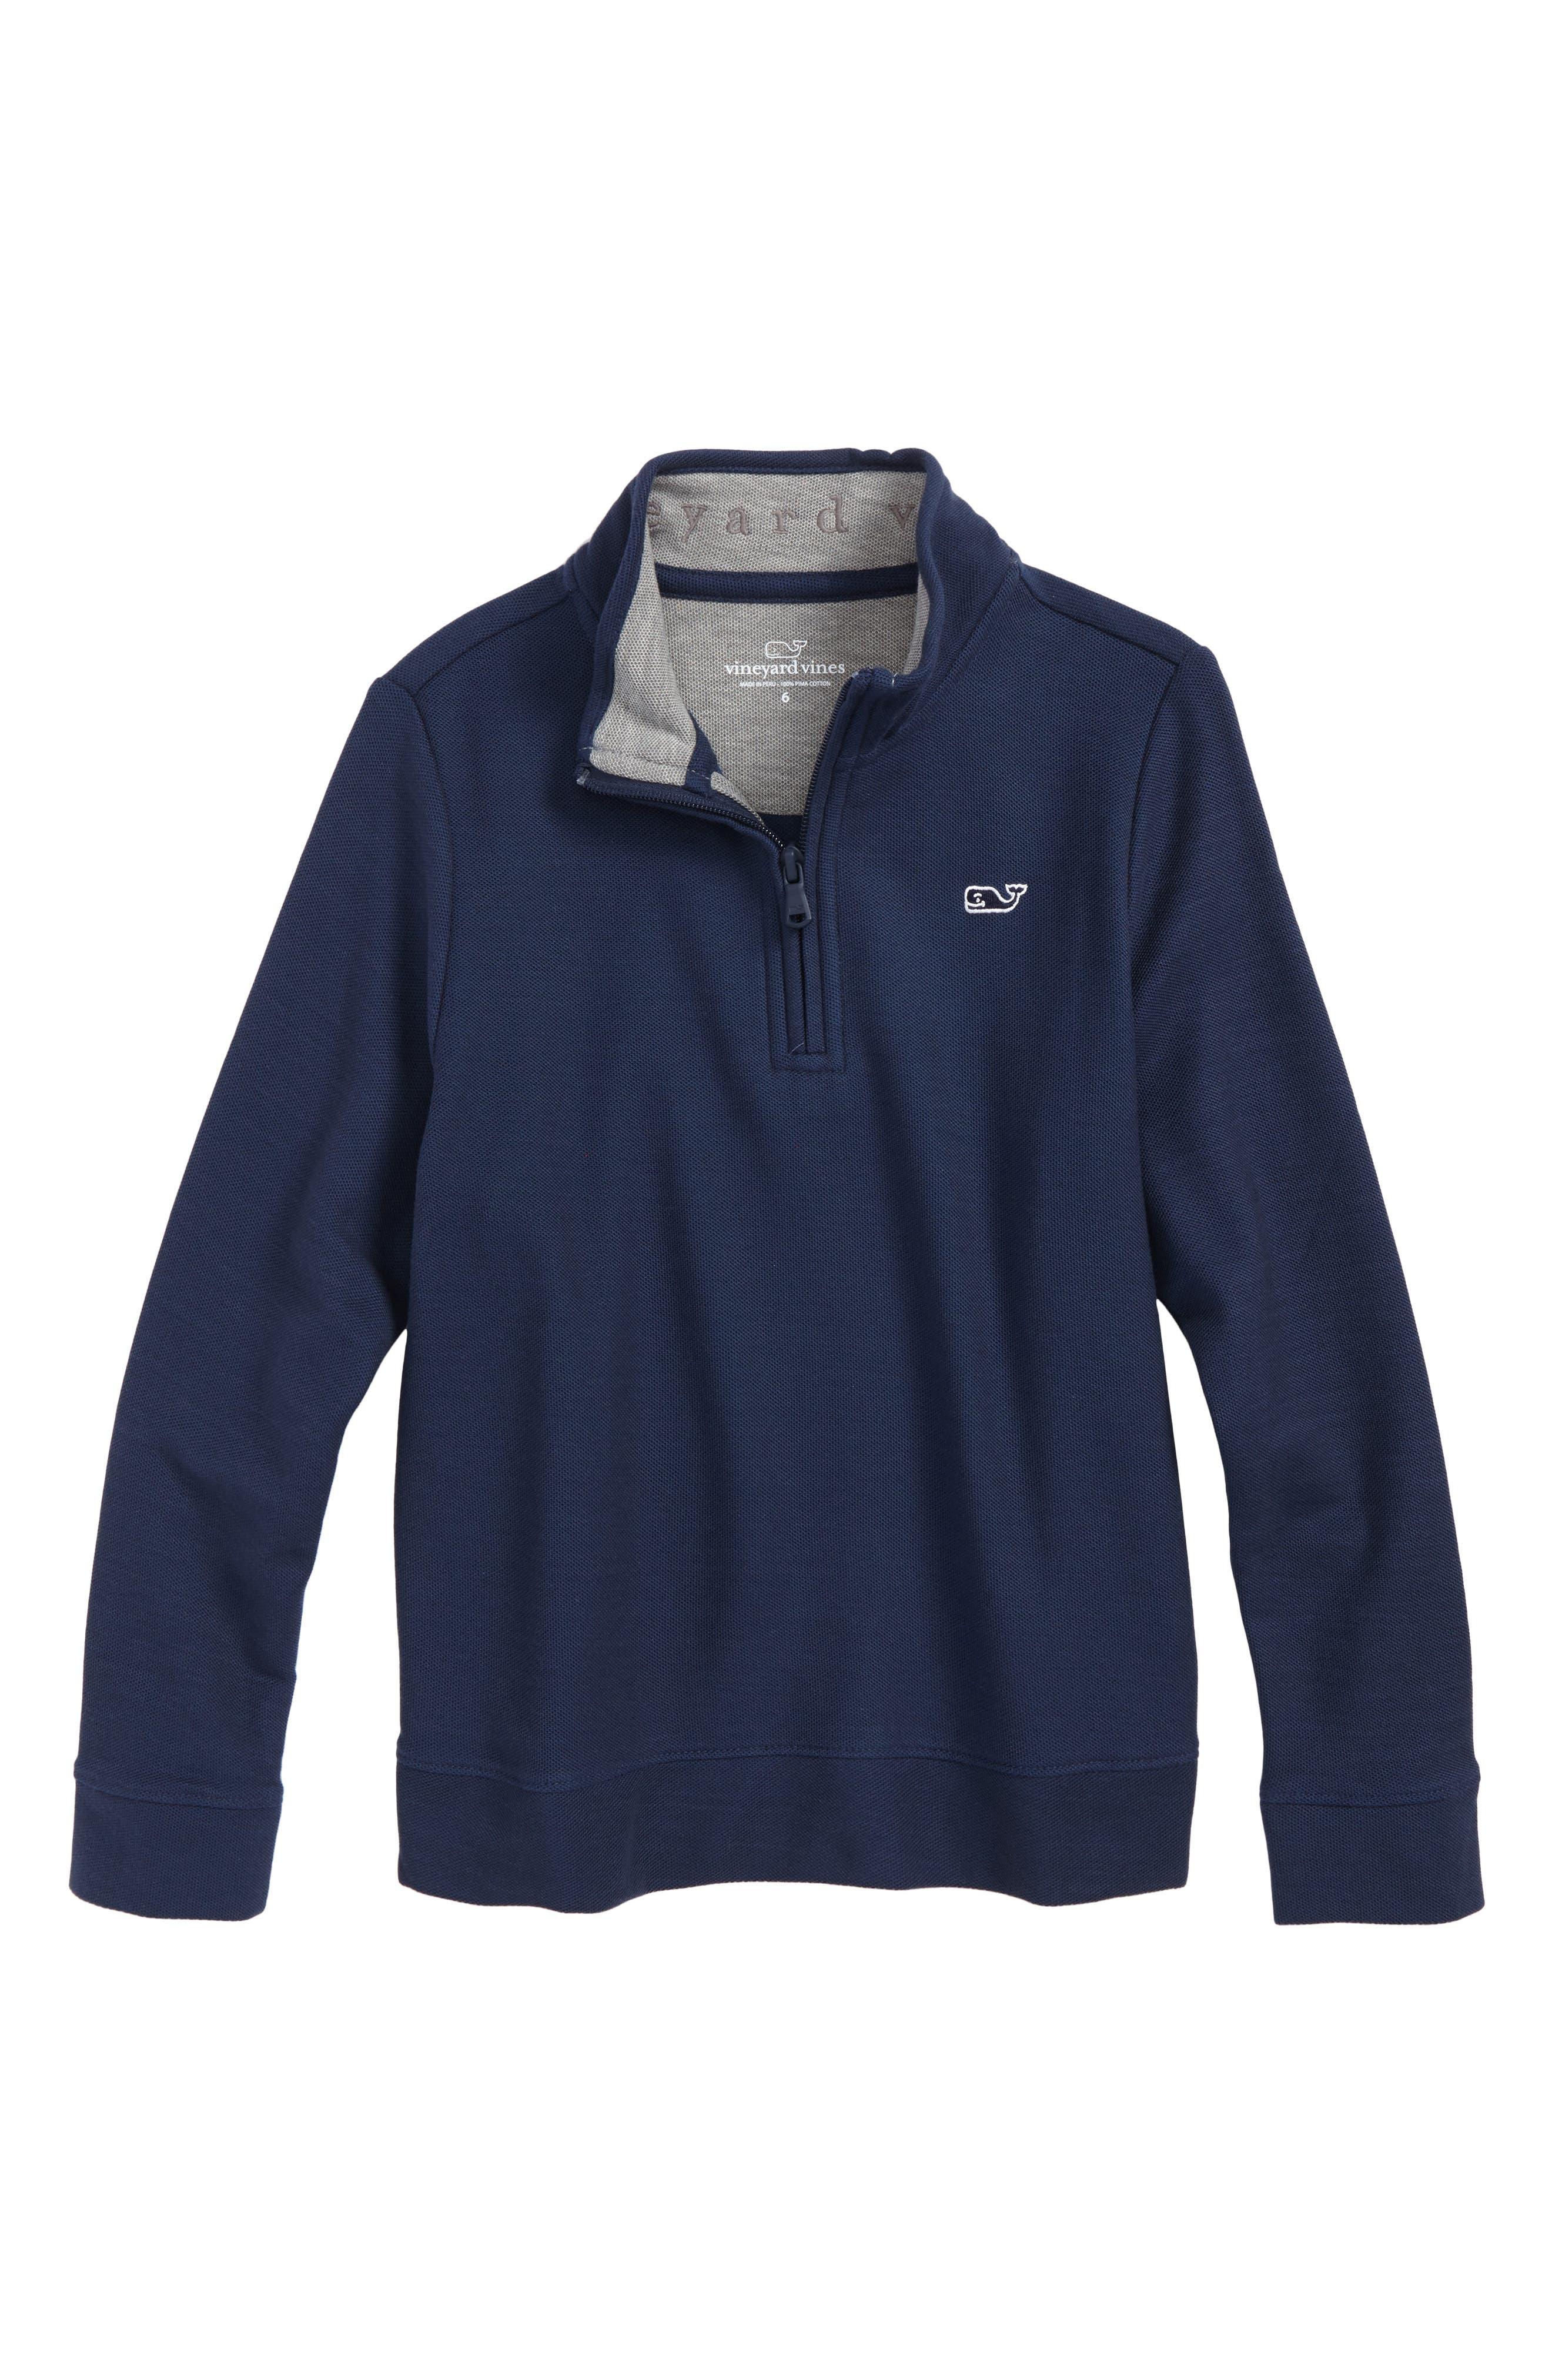 Quarter Zip Sweater,                             Main thumbnail 1, color,                             Vineyard Navy